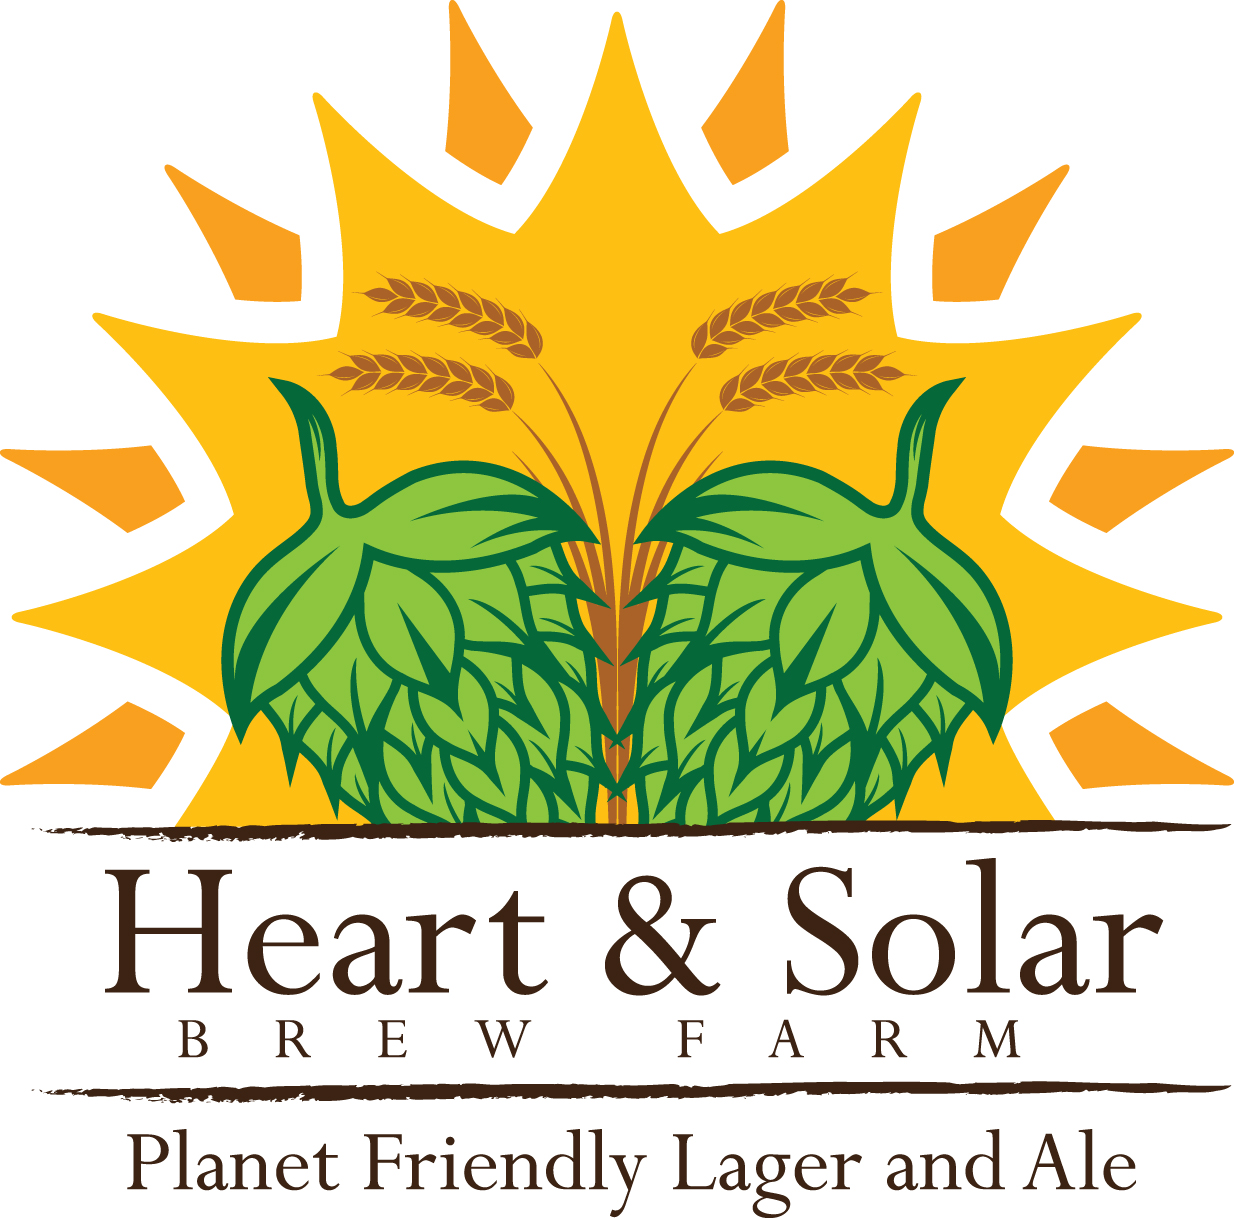 Heart & Solar Brew Farm